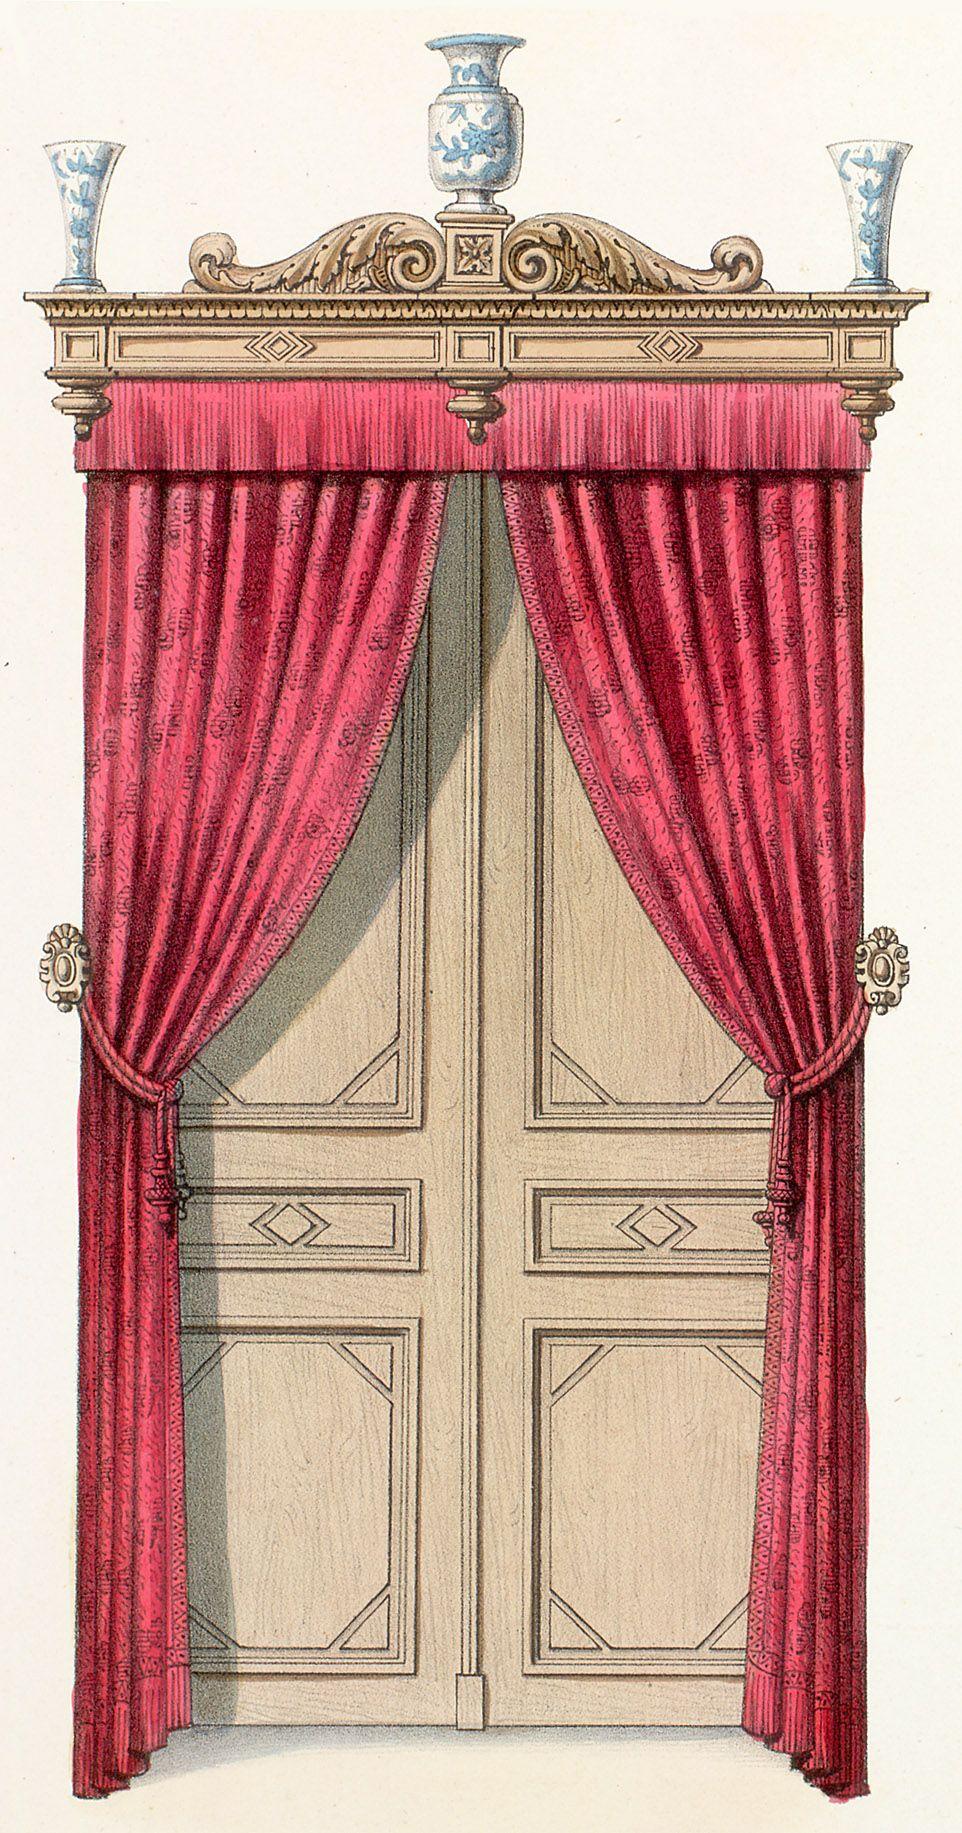 Plate number: L. 54 Pl. 151 Type: Floor Plans  : Interior Elevations : Doors  Style: Renaissance Revival  Enlarge Image